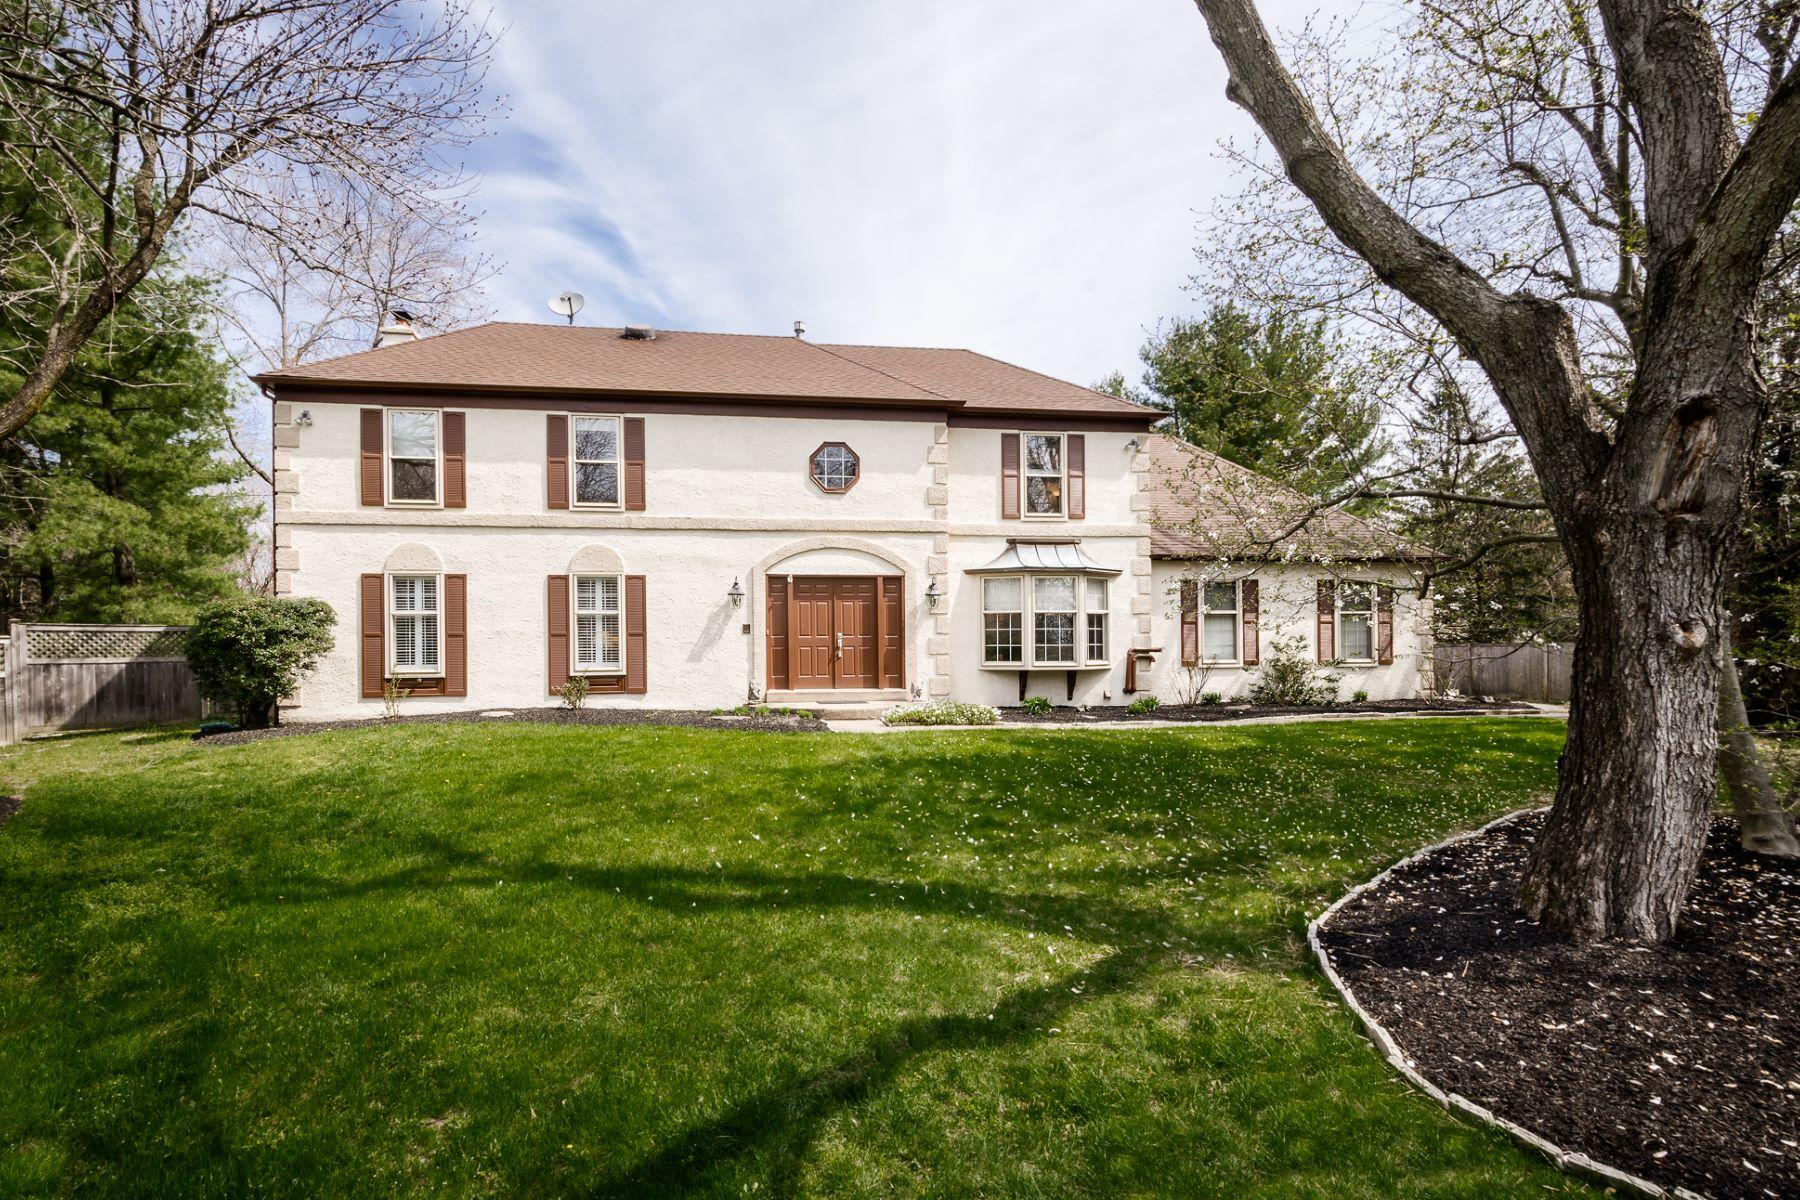 Частный односемейный дом для того Продажа на Relax and Entertain in a serene Lawrenceville Home 6 Knox Court Lawrenceville, 08648 Соединенные Штаты